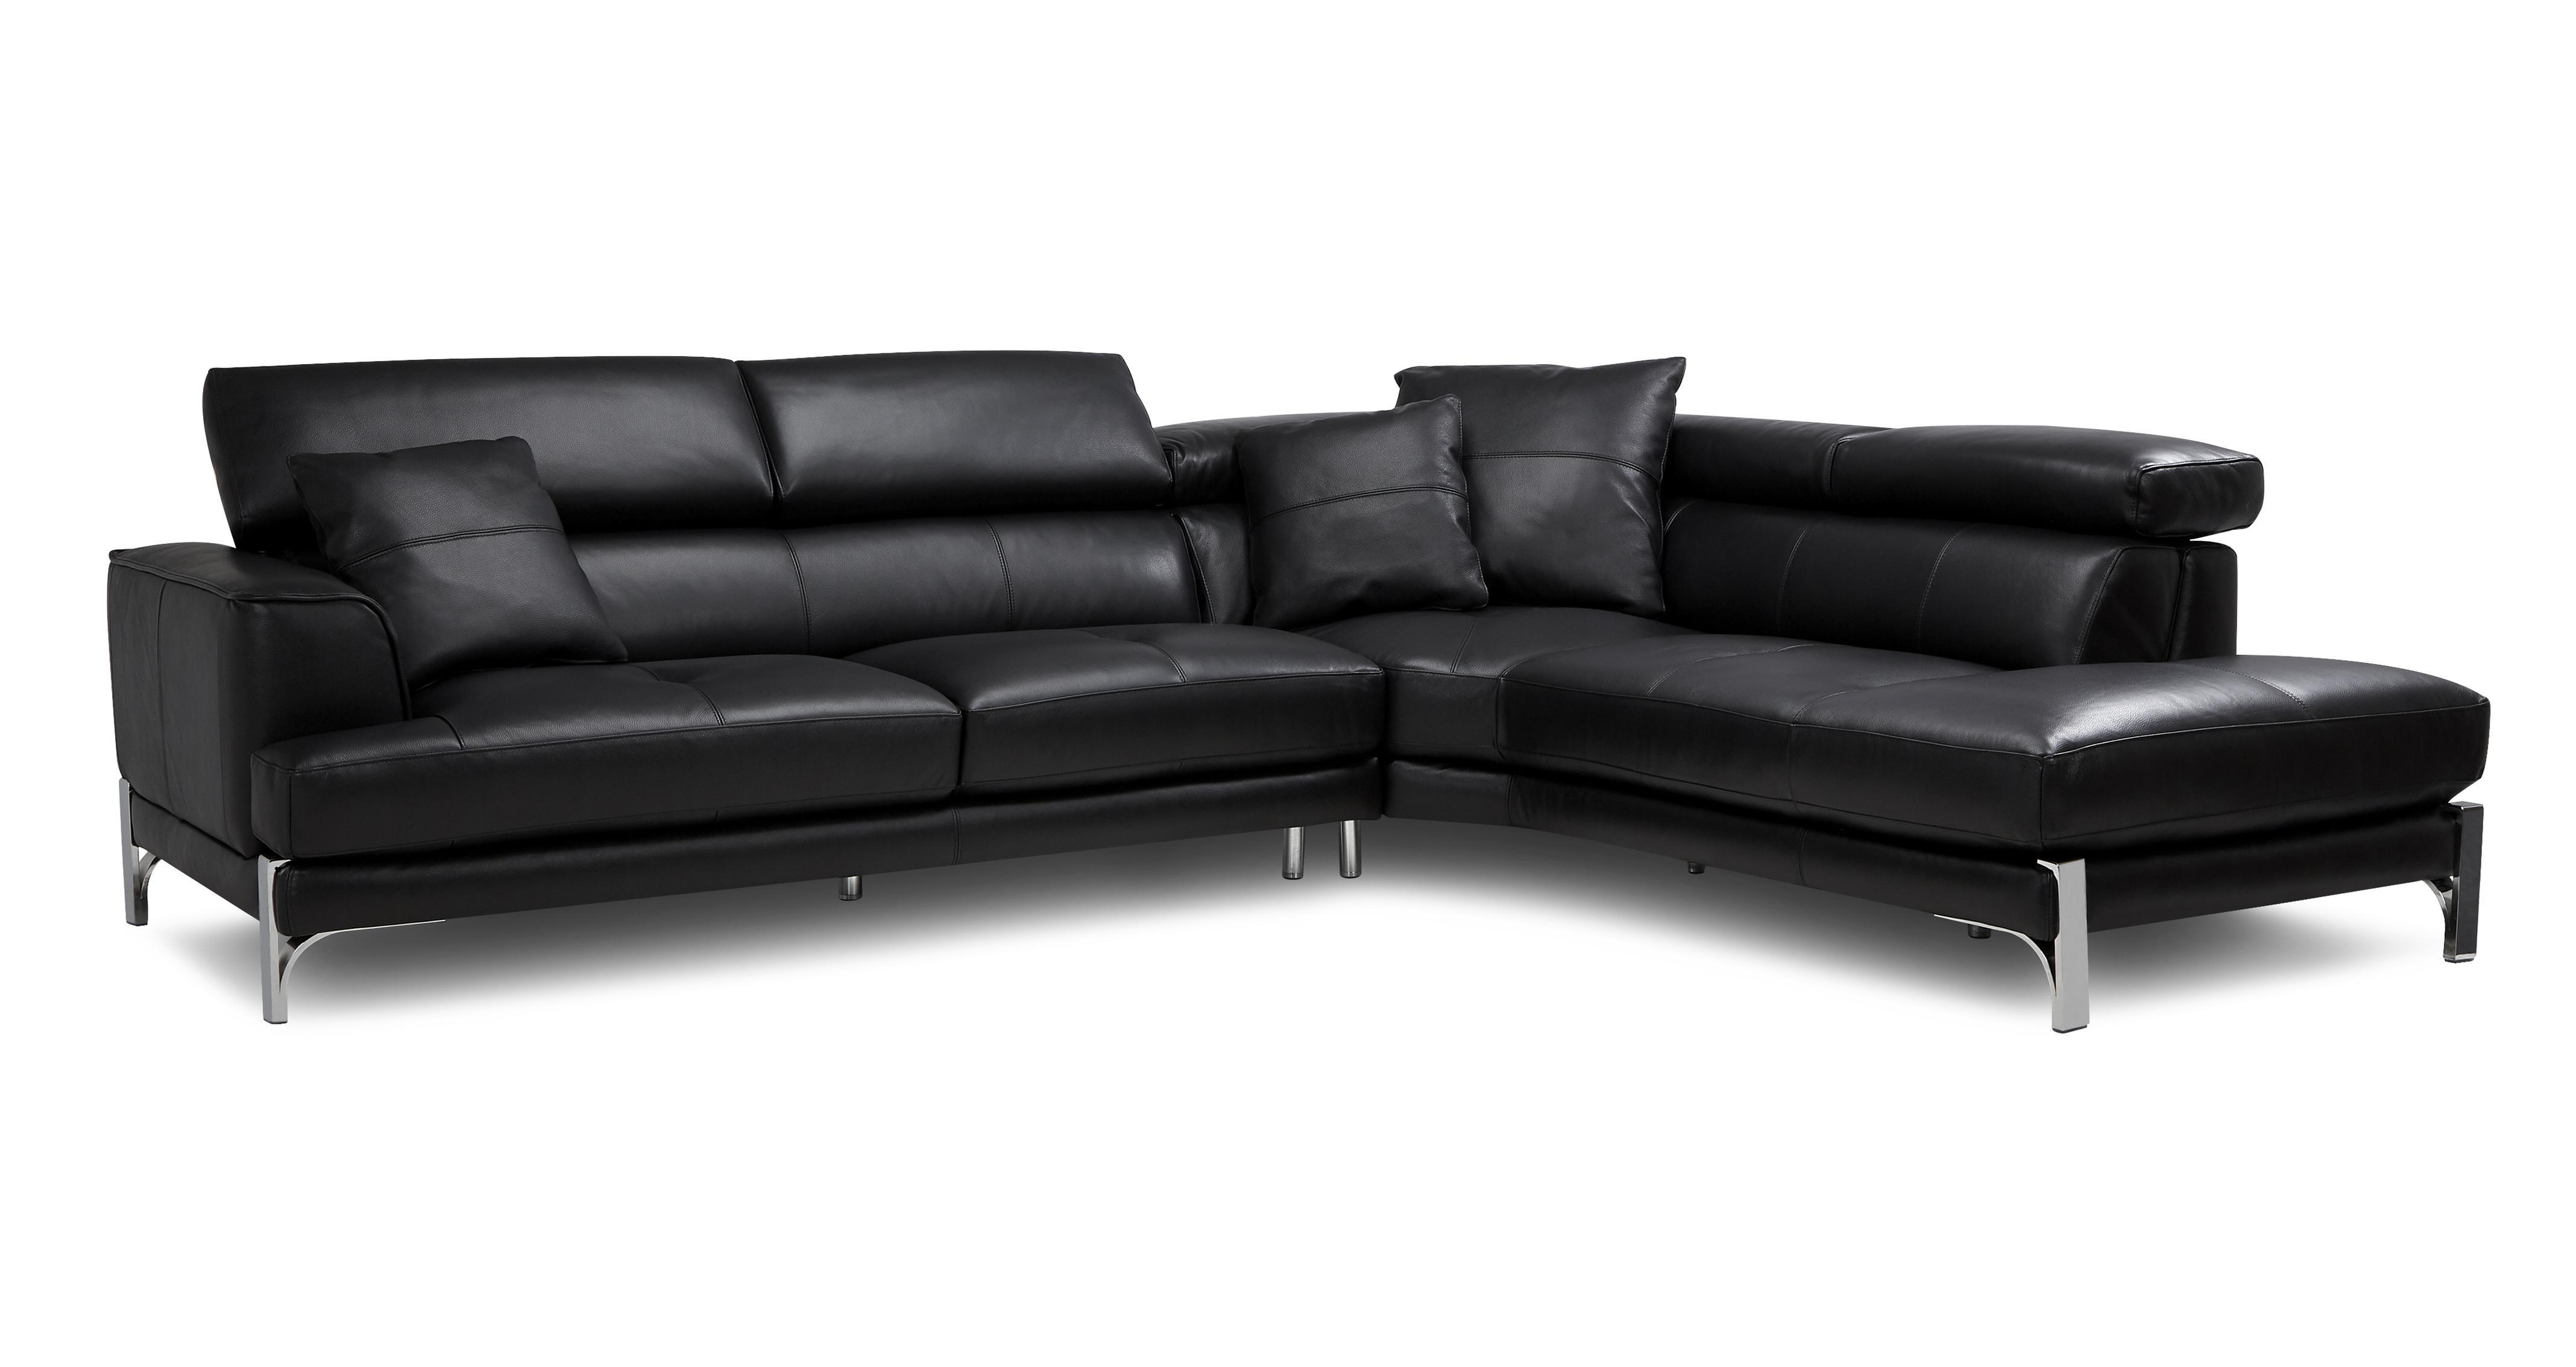 Large Corner Sofa Dfs: Stage Left Arm Facing Large Corner Sofa New Club